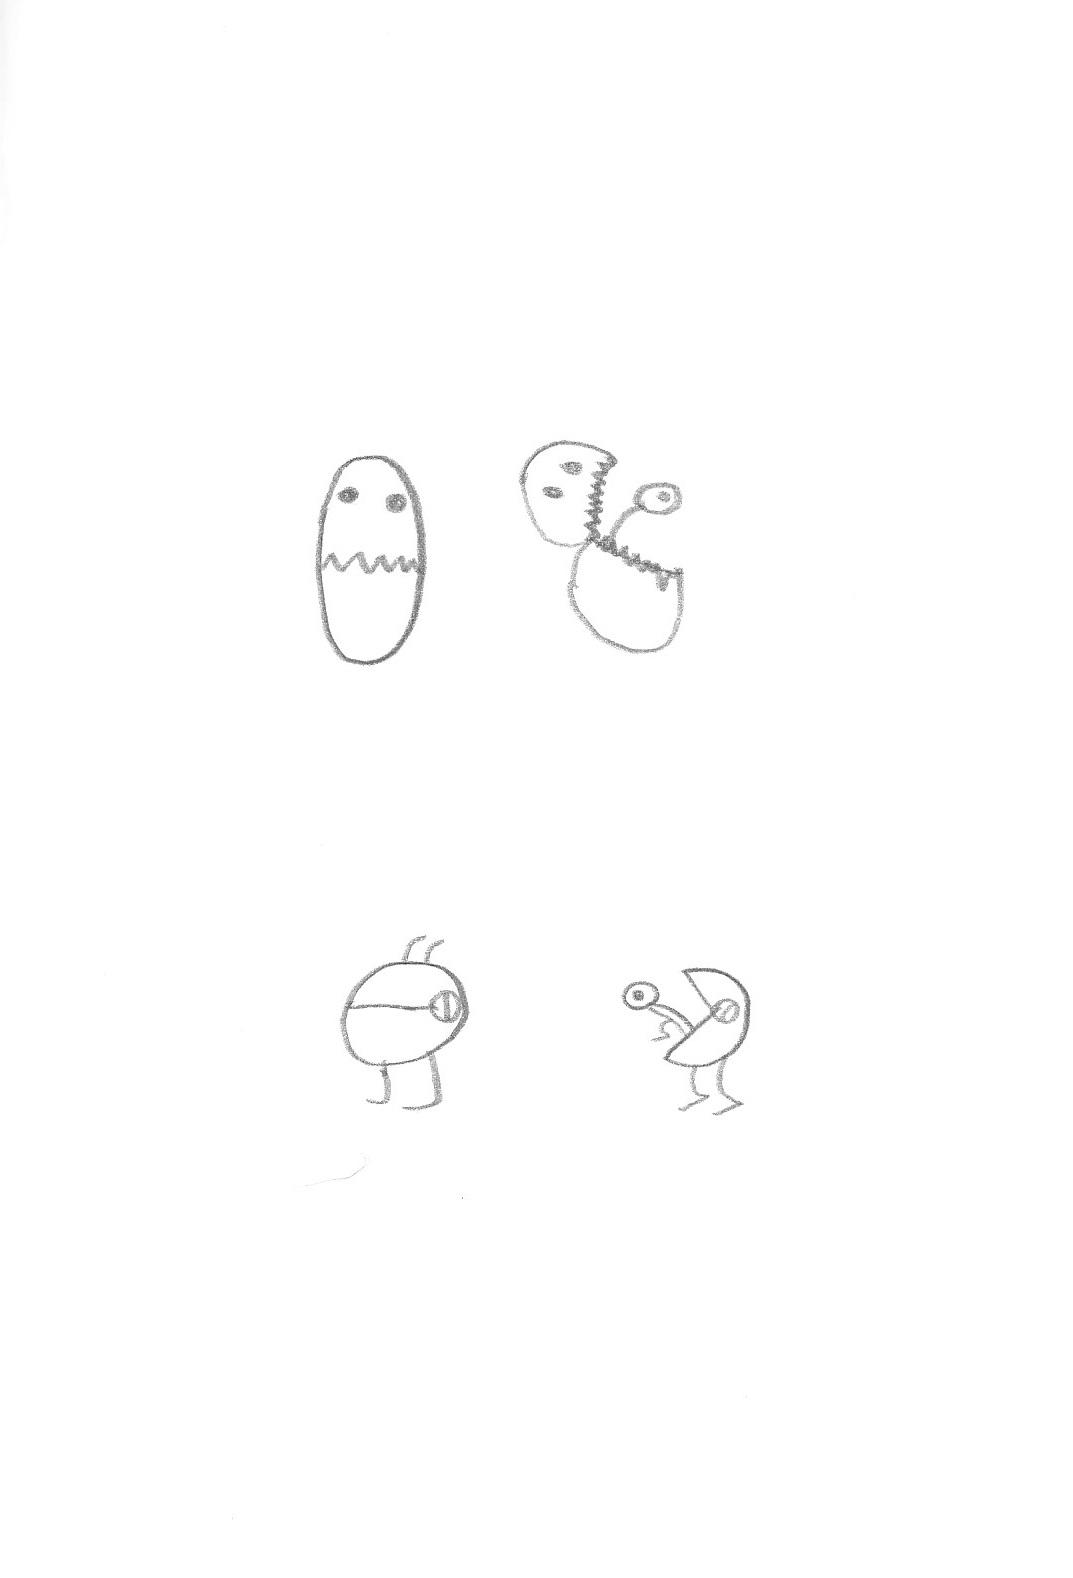 Characters-Various-Characters (1).png